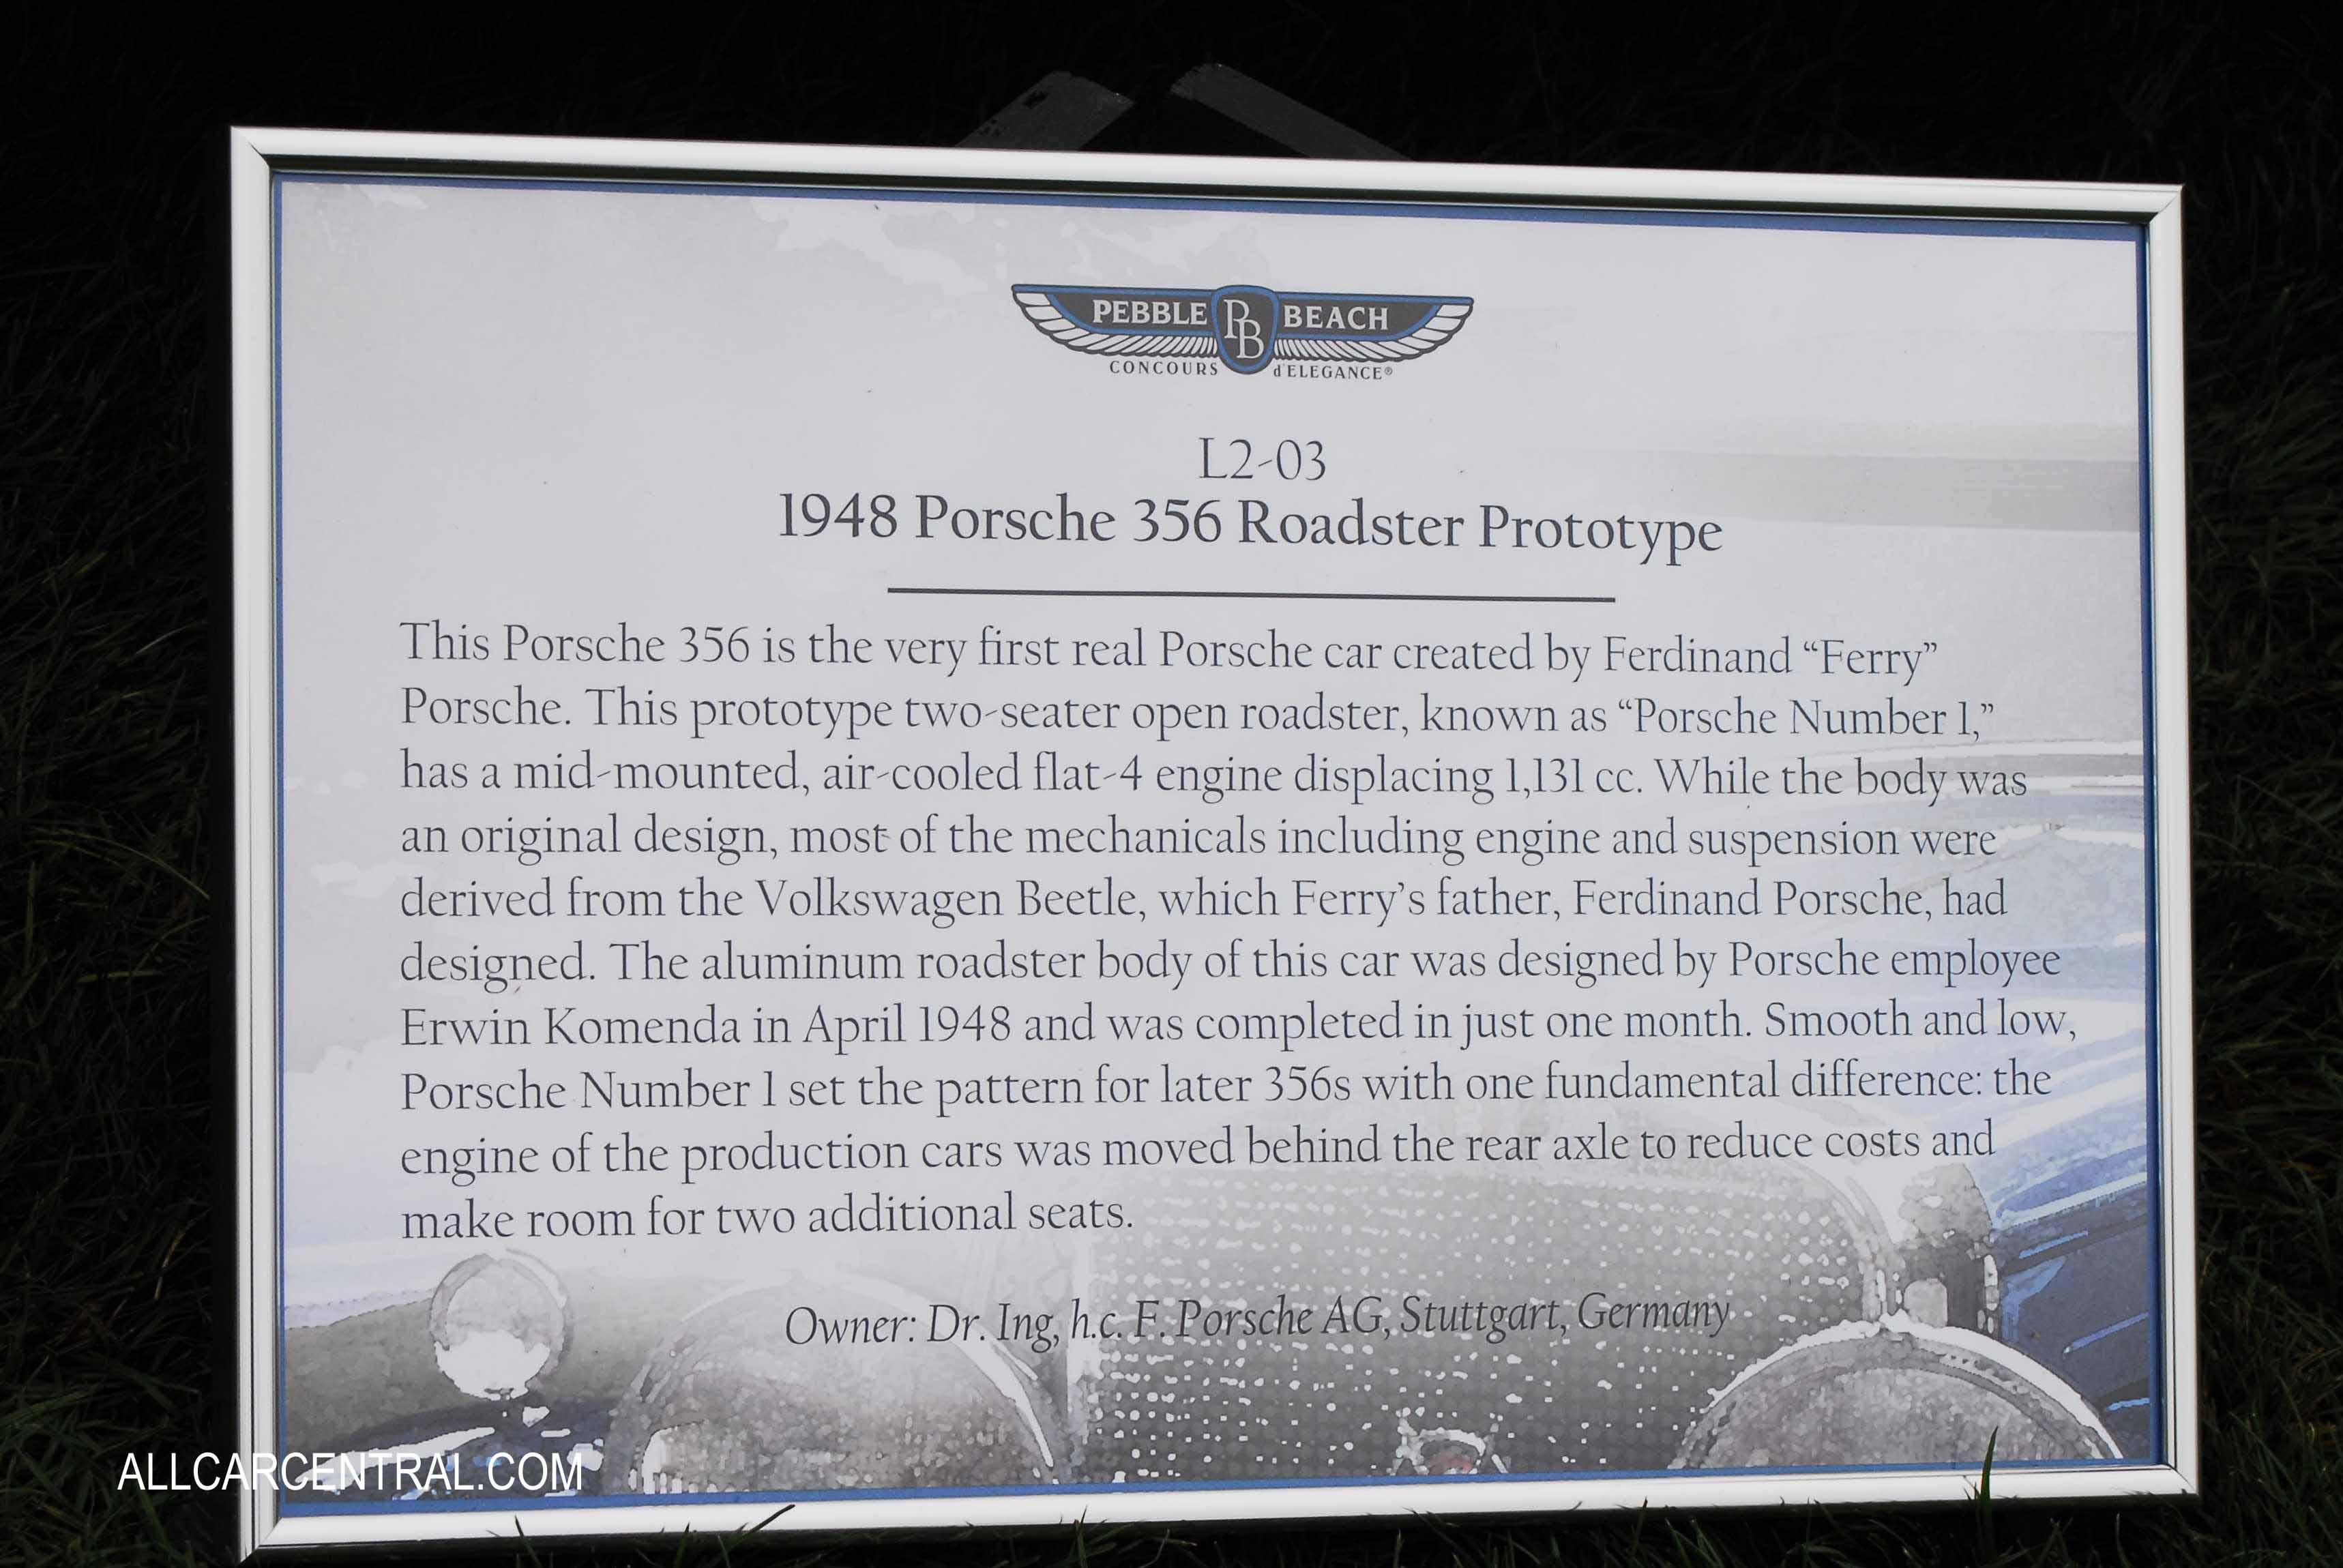 Porsche 356 1948 gallery all car central magazine porsche 356 1948 gallery vanachro Choice Image